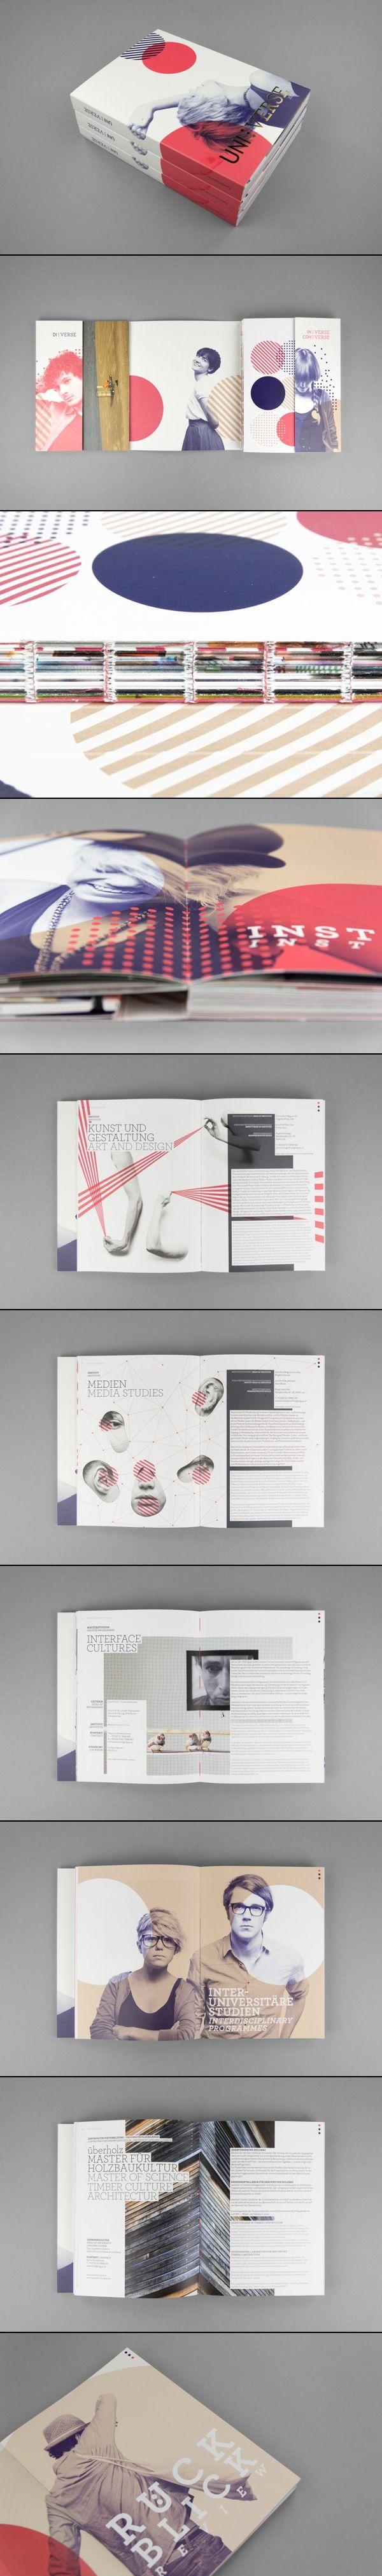 UNI:VERSE 2012 Image-Publication for the Art University of Linz